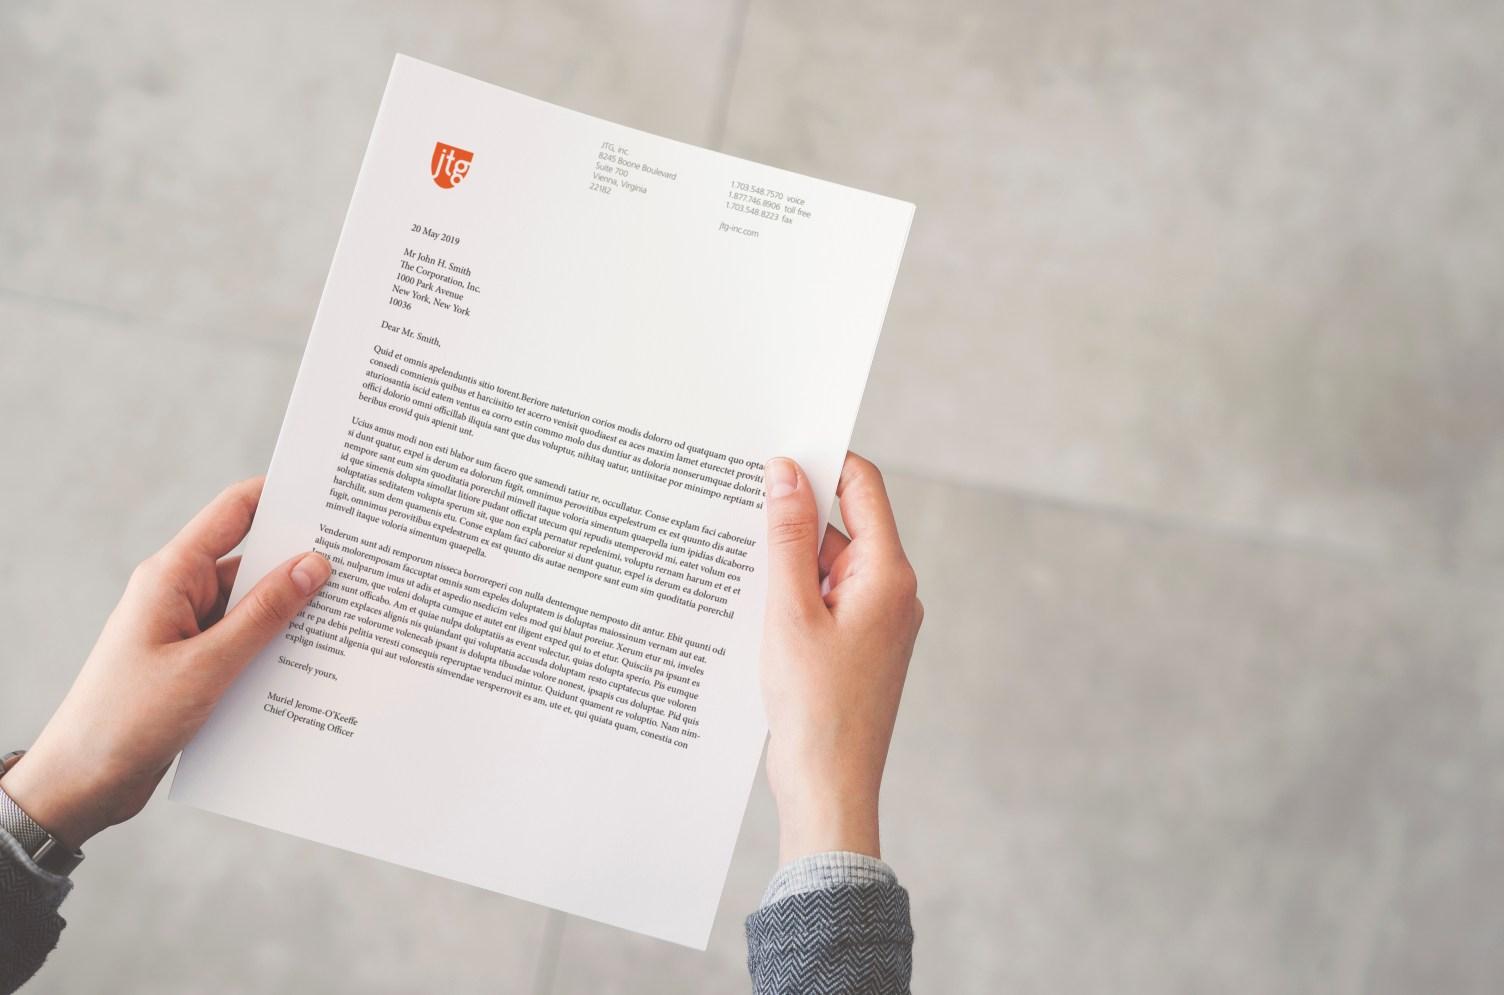 JTG, inc. letterhead